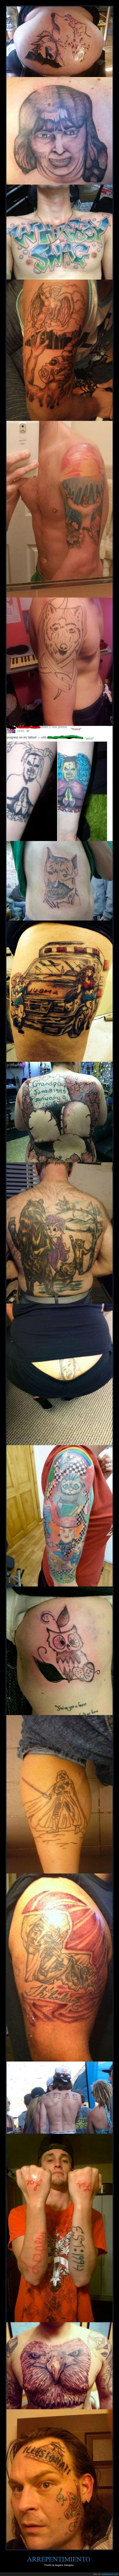 arrepentimiento,cara,feo,horrible,tattoo,tatuaje